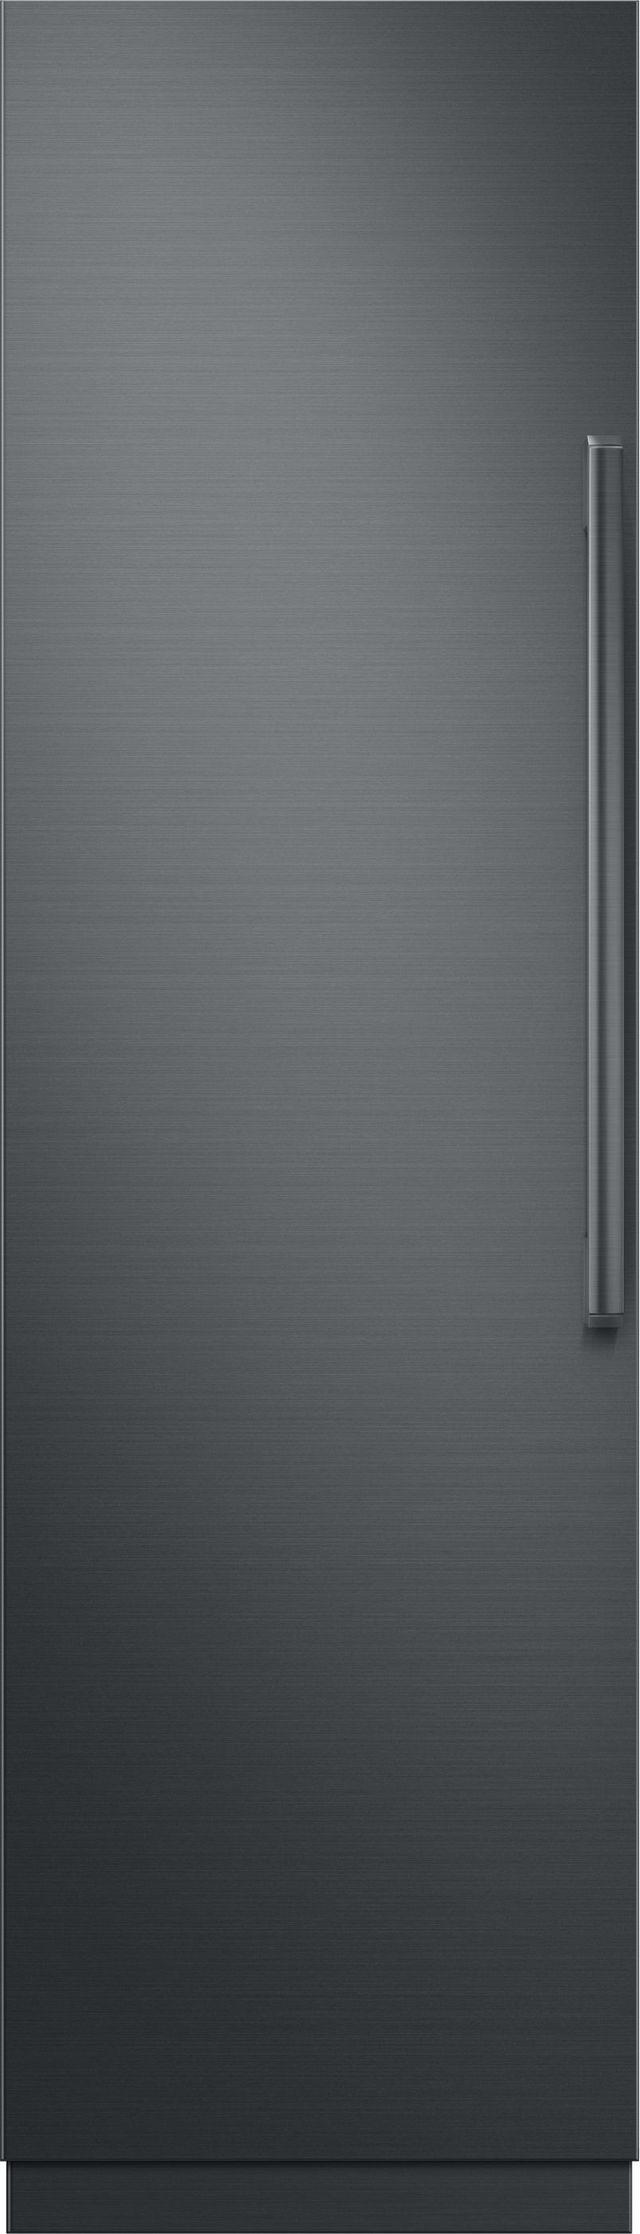 Dacor® Contemporary 13.6 Cu. Ft. Panel Ready Upright Freezer Column-DRZ24980LAP